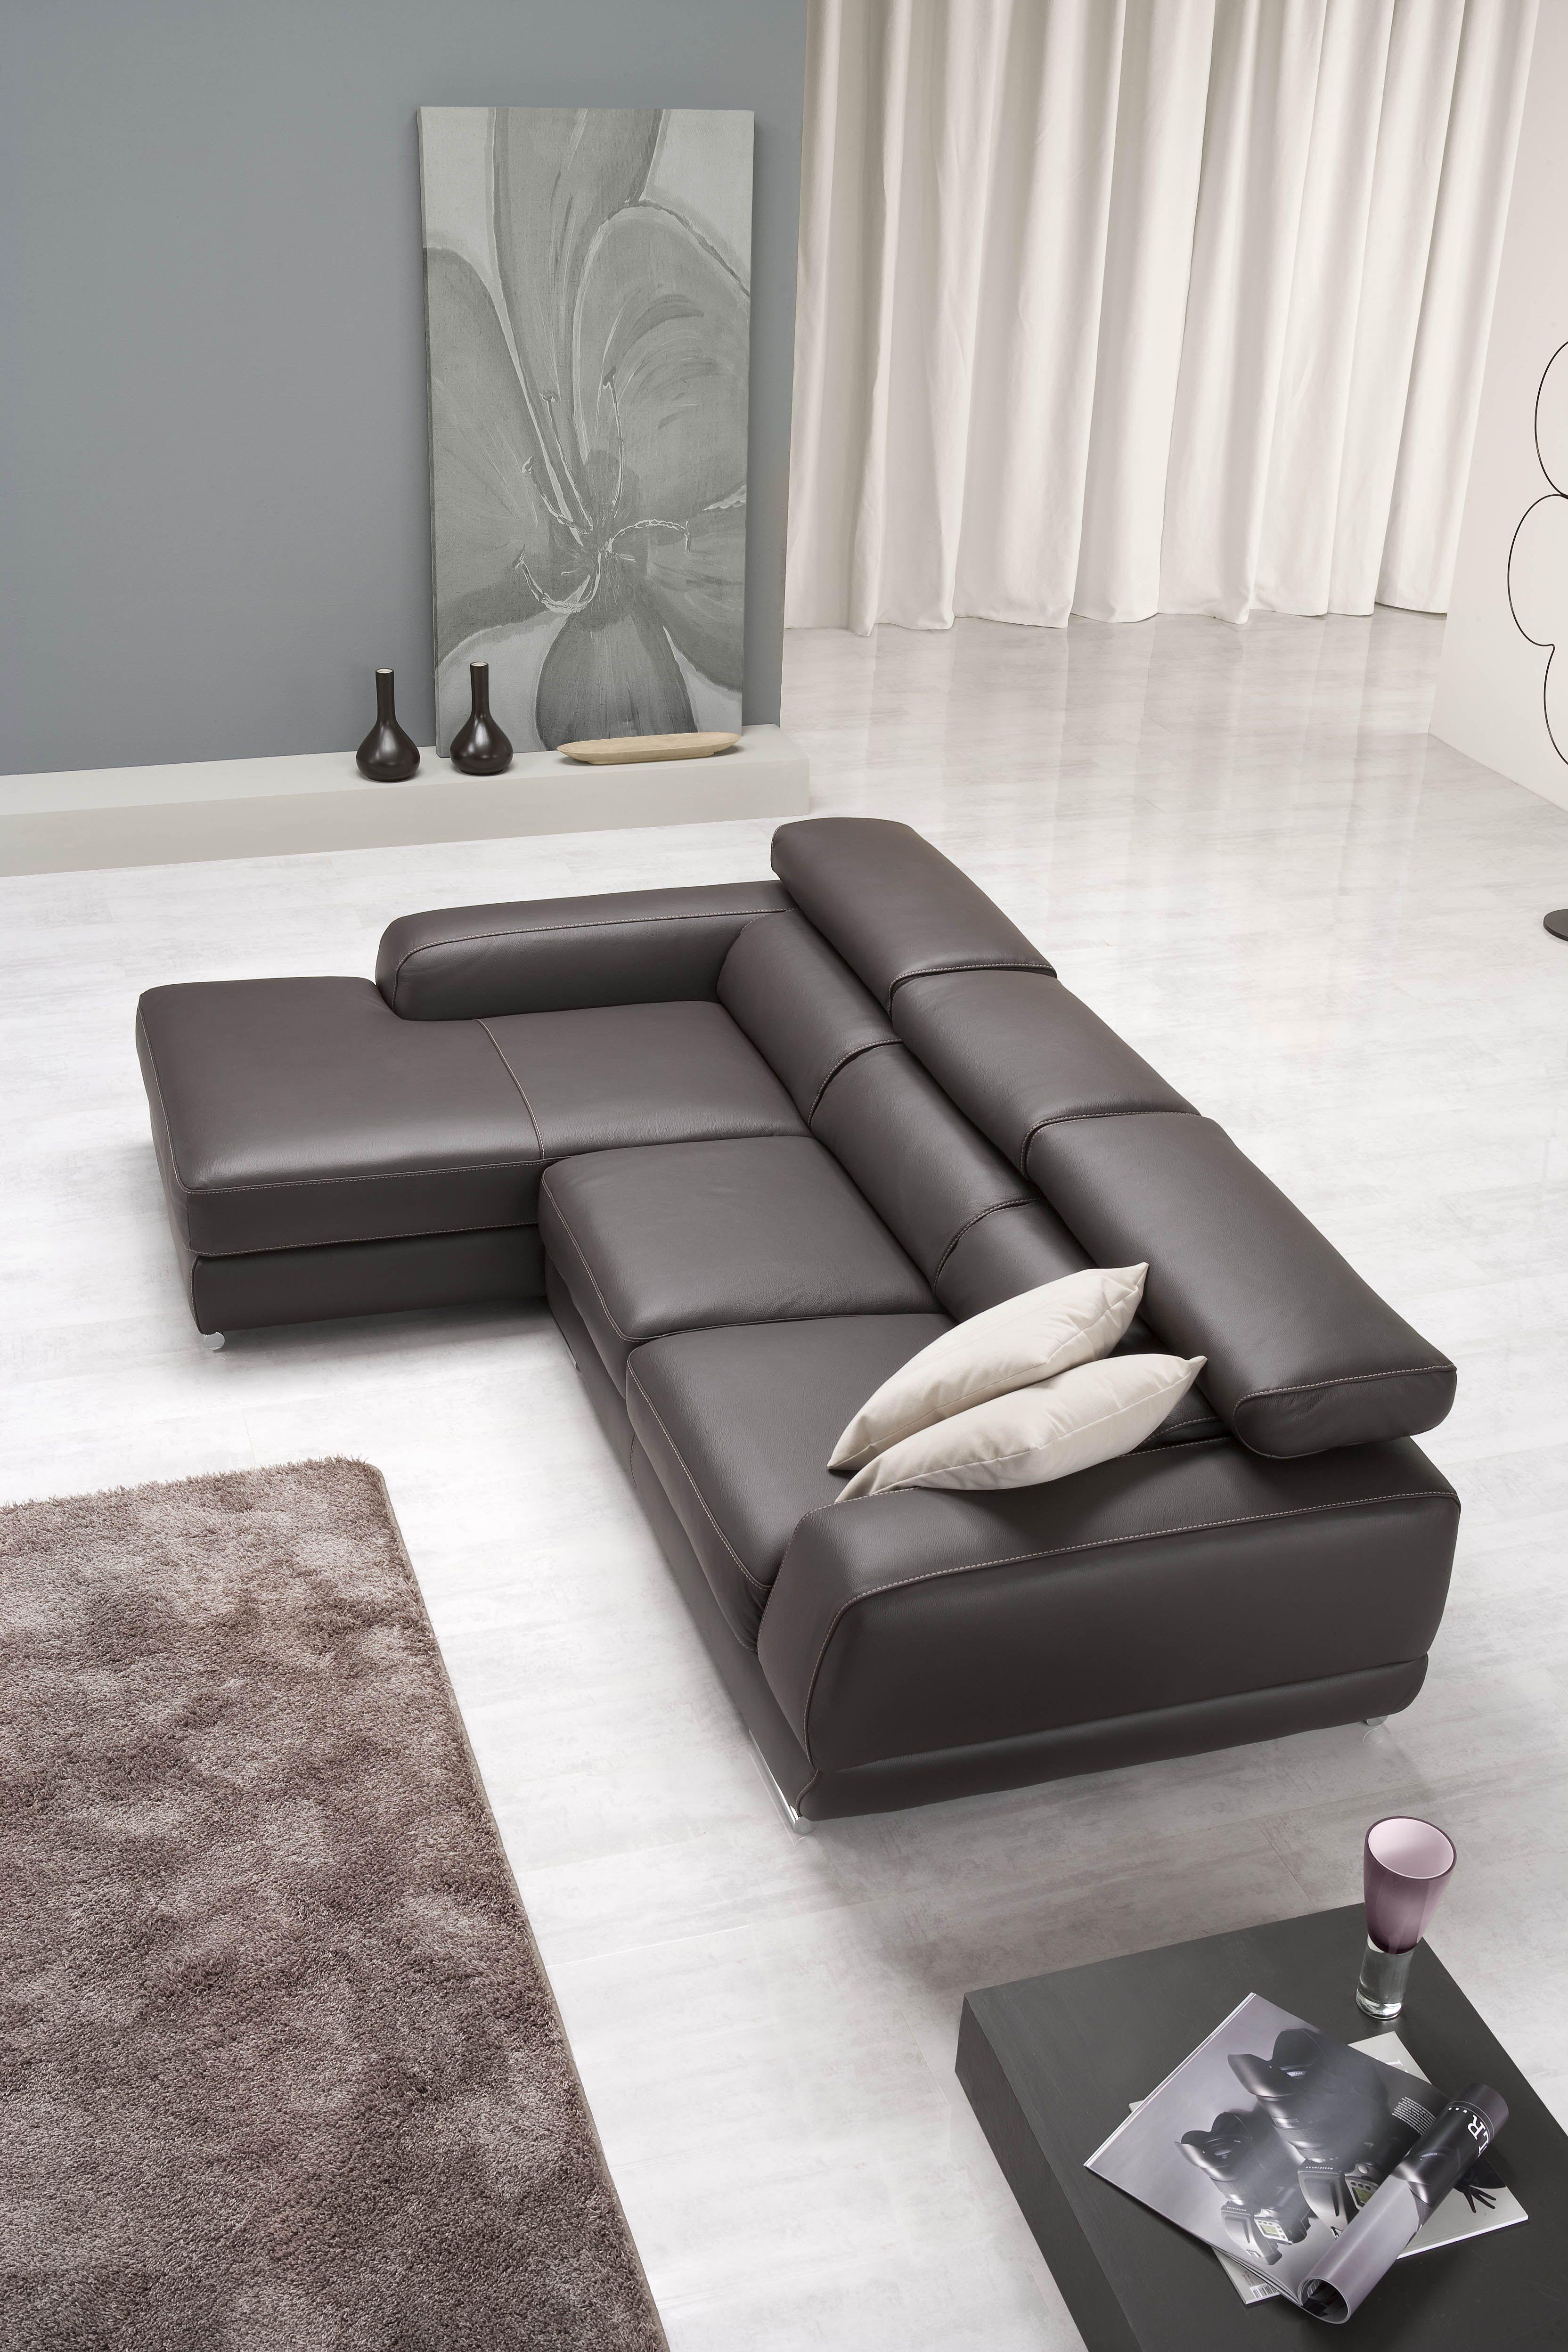 Ecointeriors Ecoexclusive Egoitaliano Couch Italian Design Dublin Santry Dunlaoghaire In 2020 Home Decor Design Home